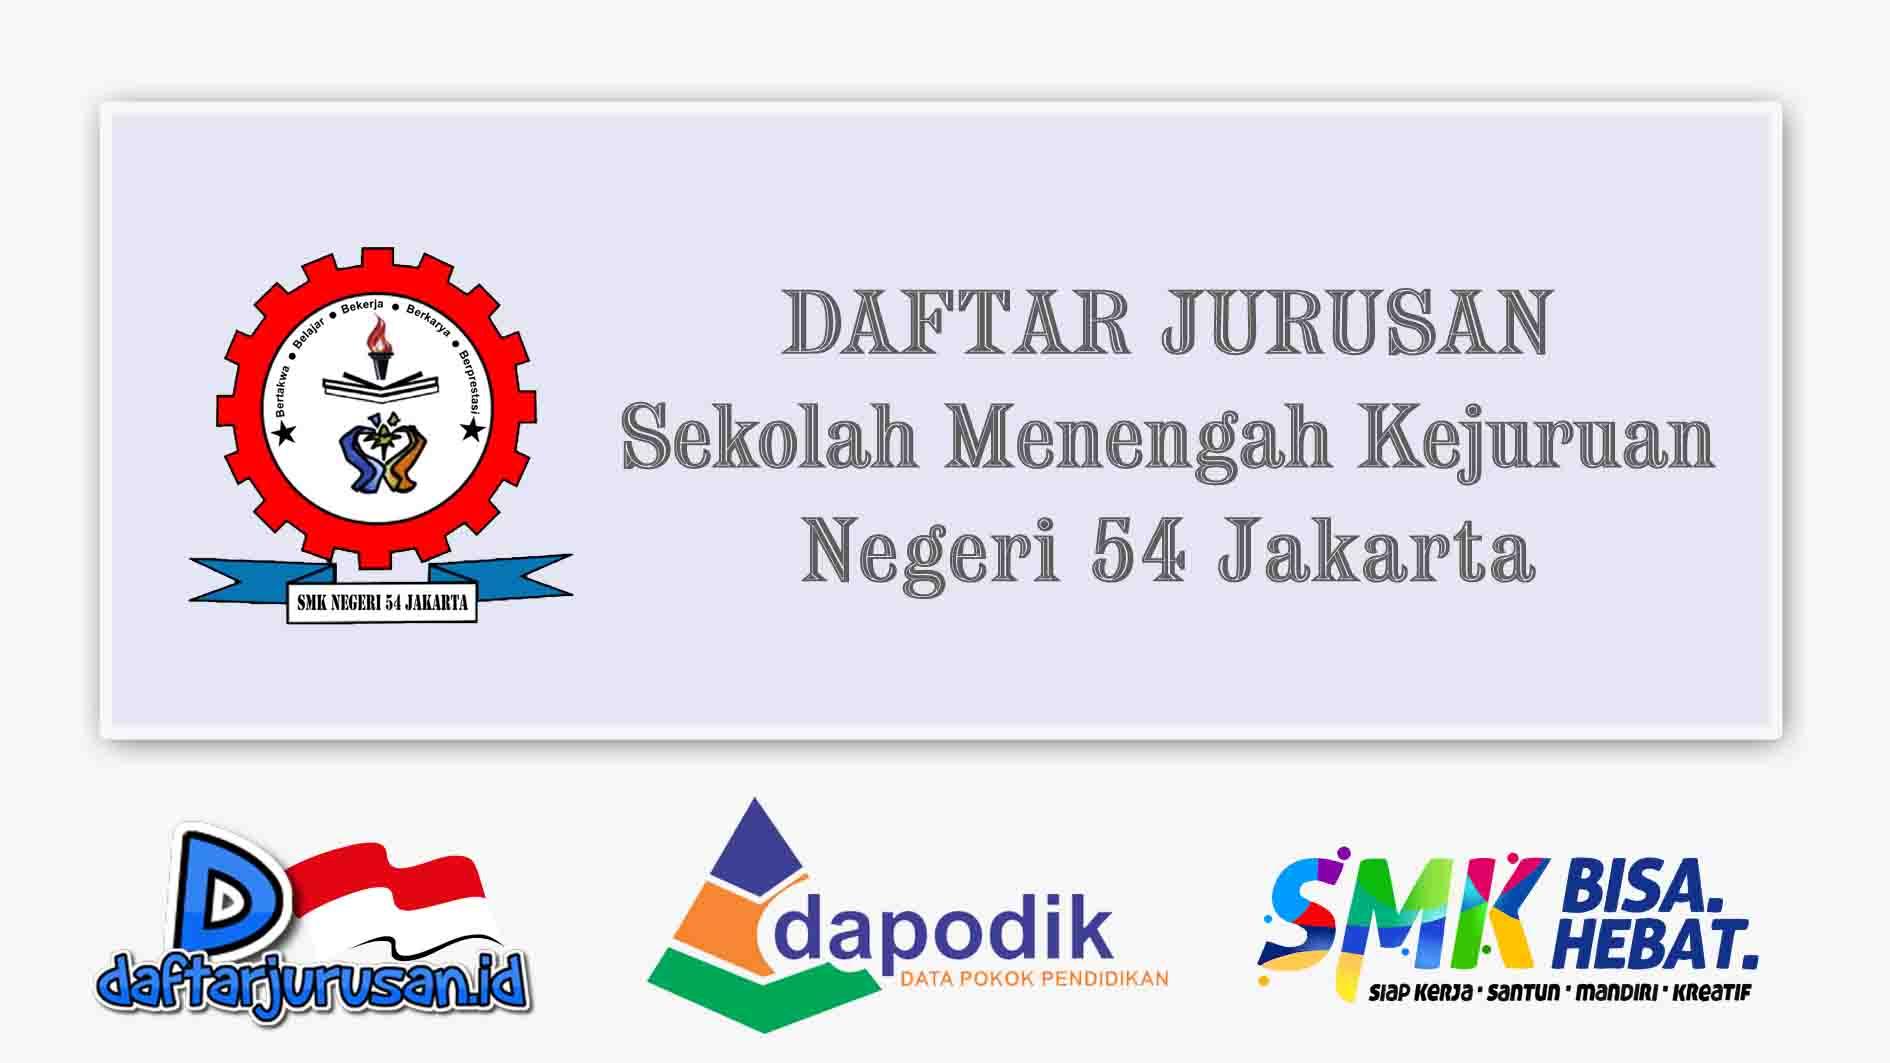 Daftar Jurusan SMK Negegeri 54 Jakarta Pusat